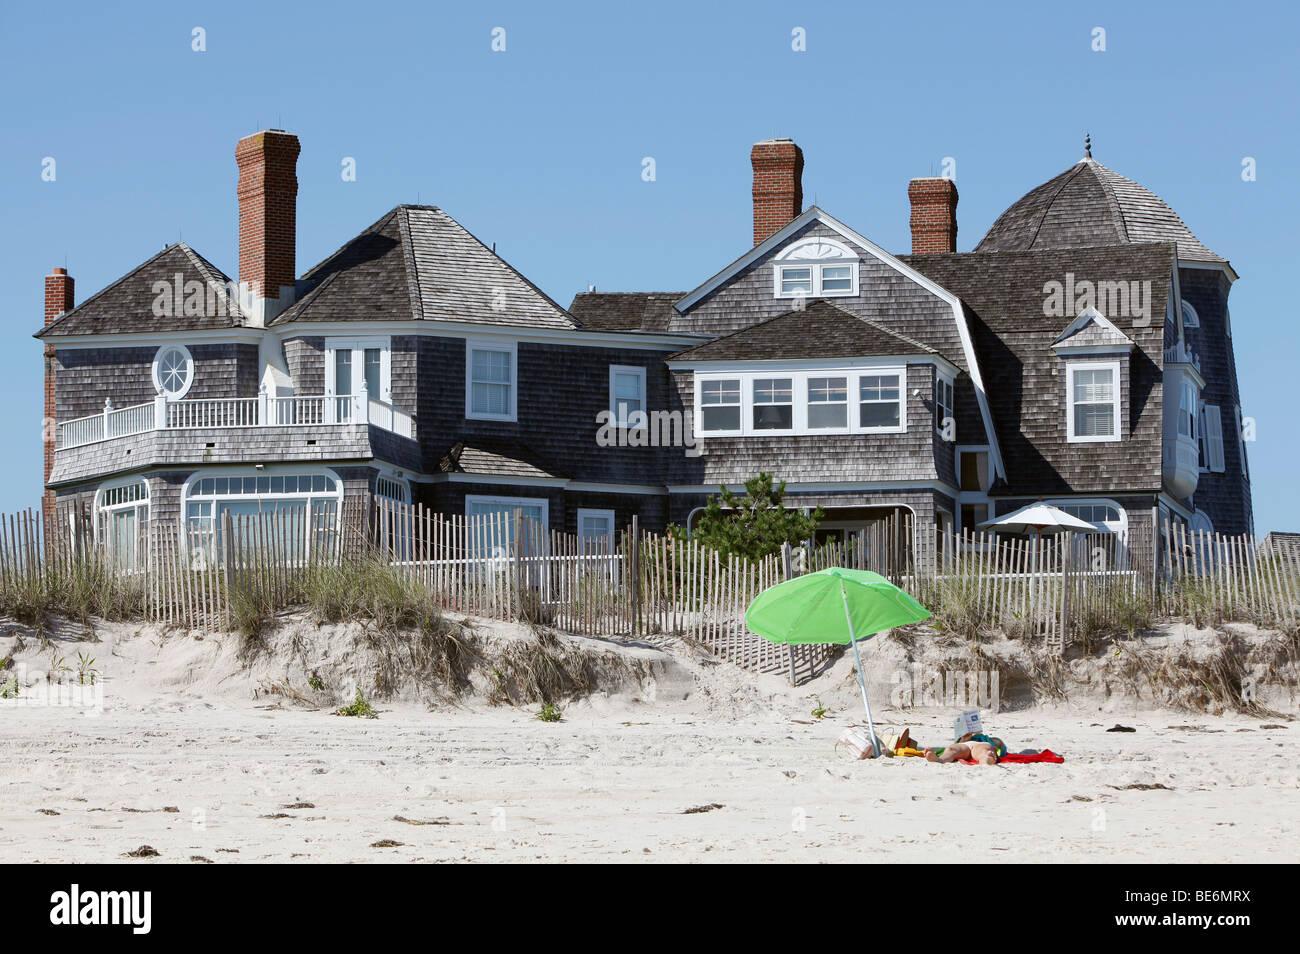 Big beach house southhampton new york stock photo for Large beach house